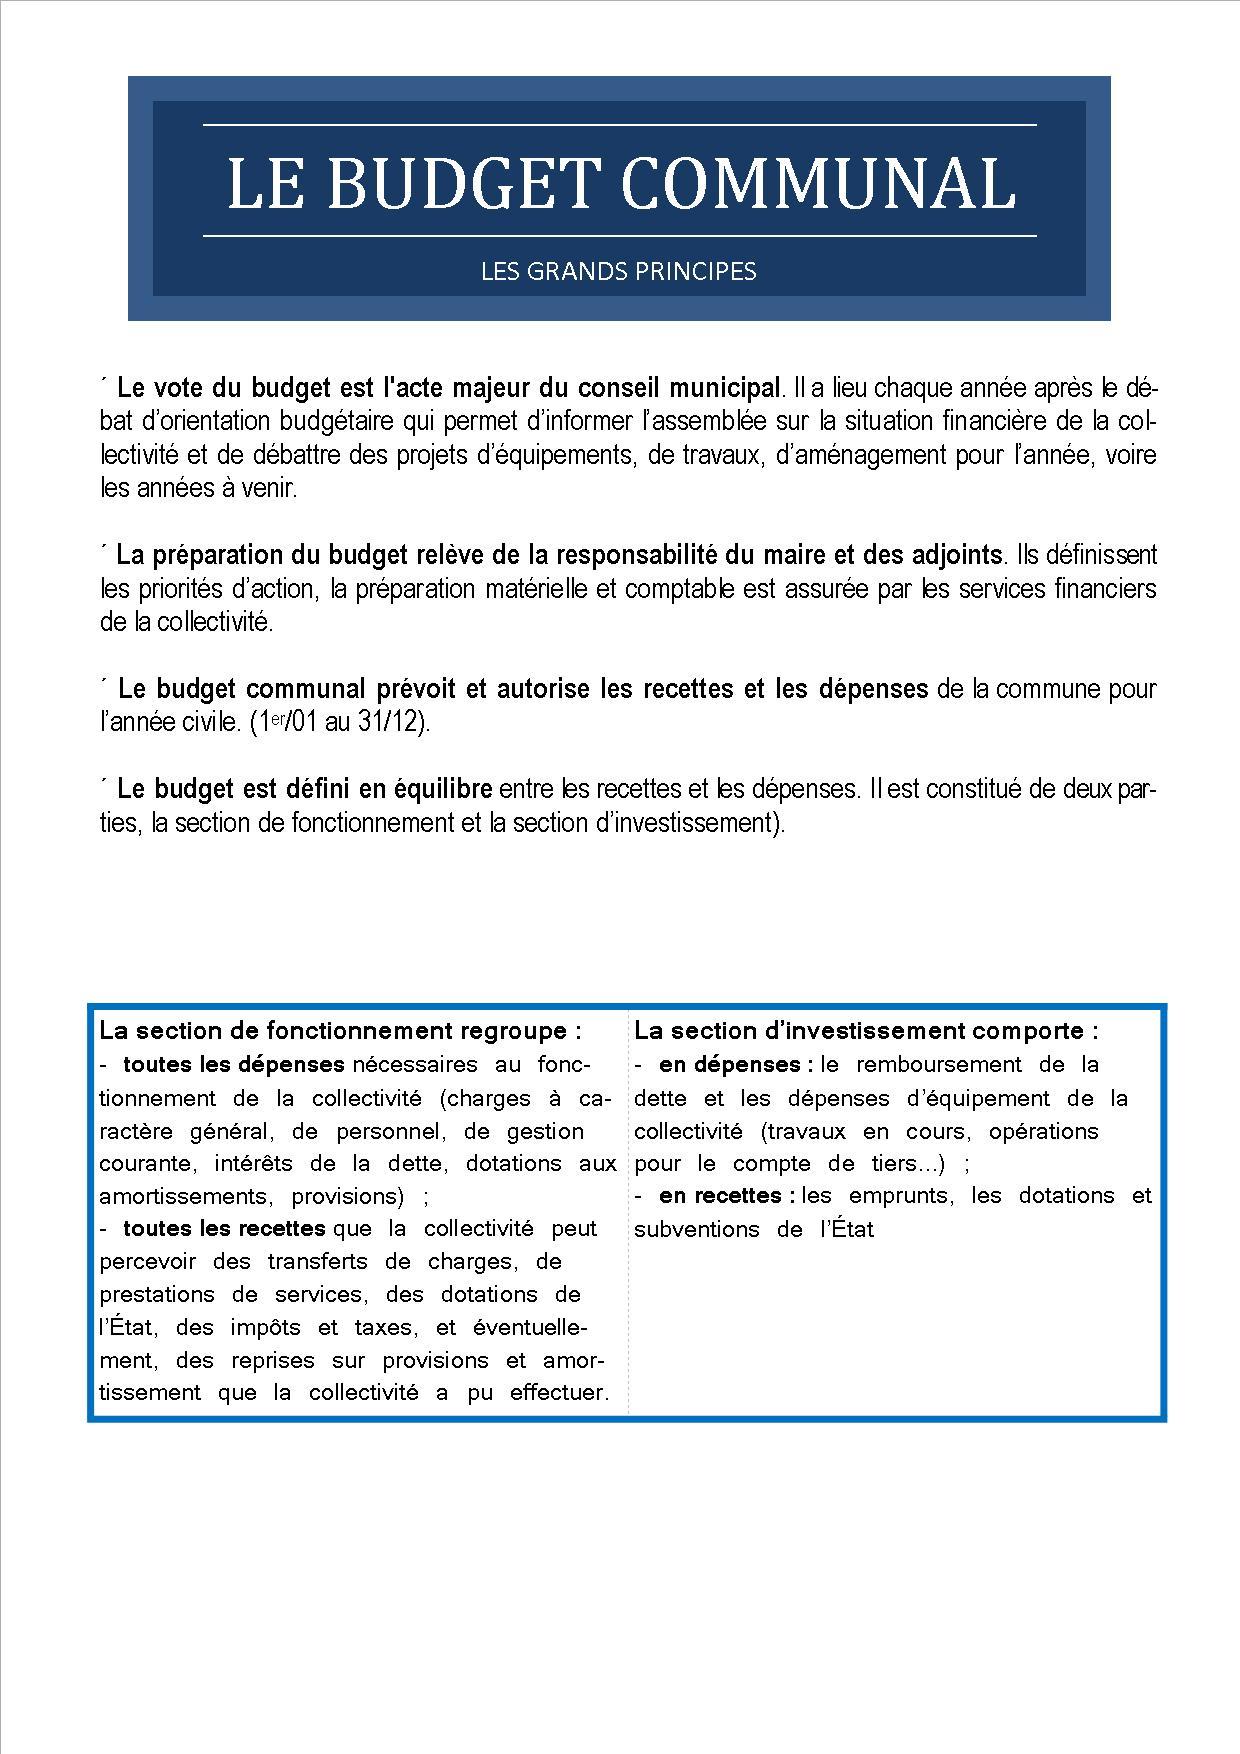 plaquette-budget-communal